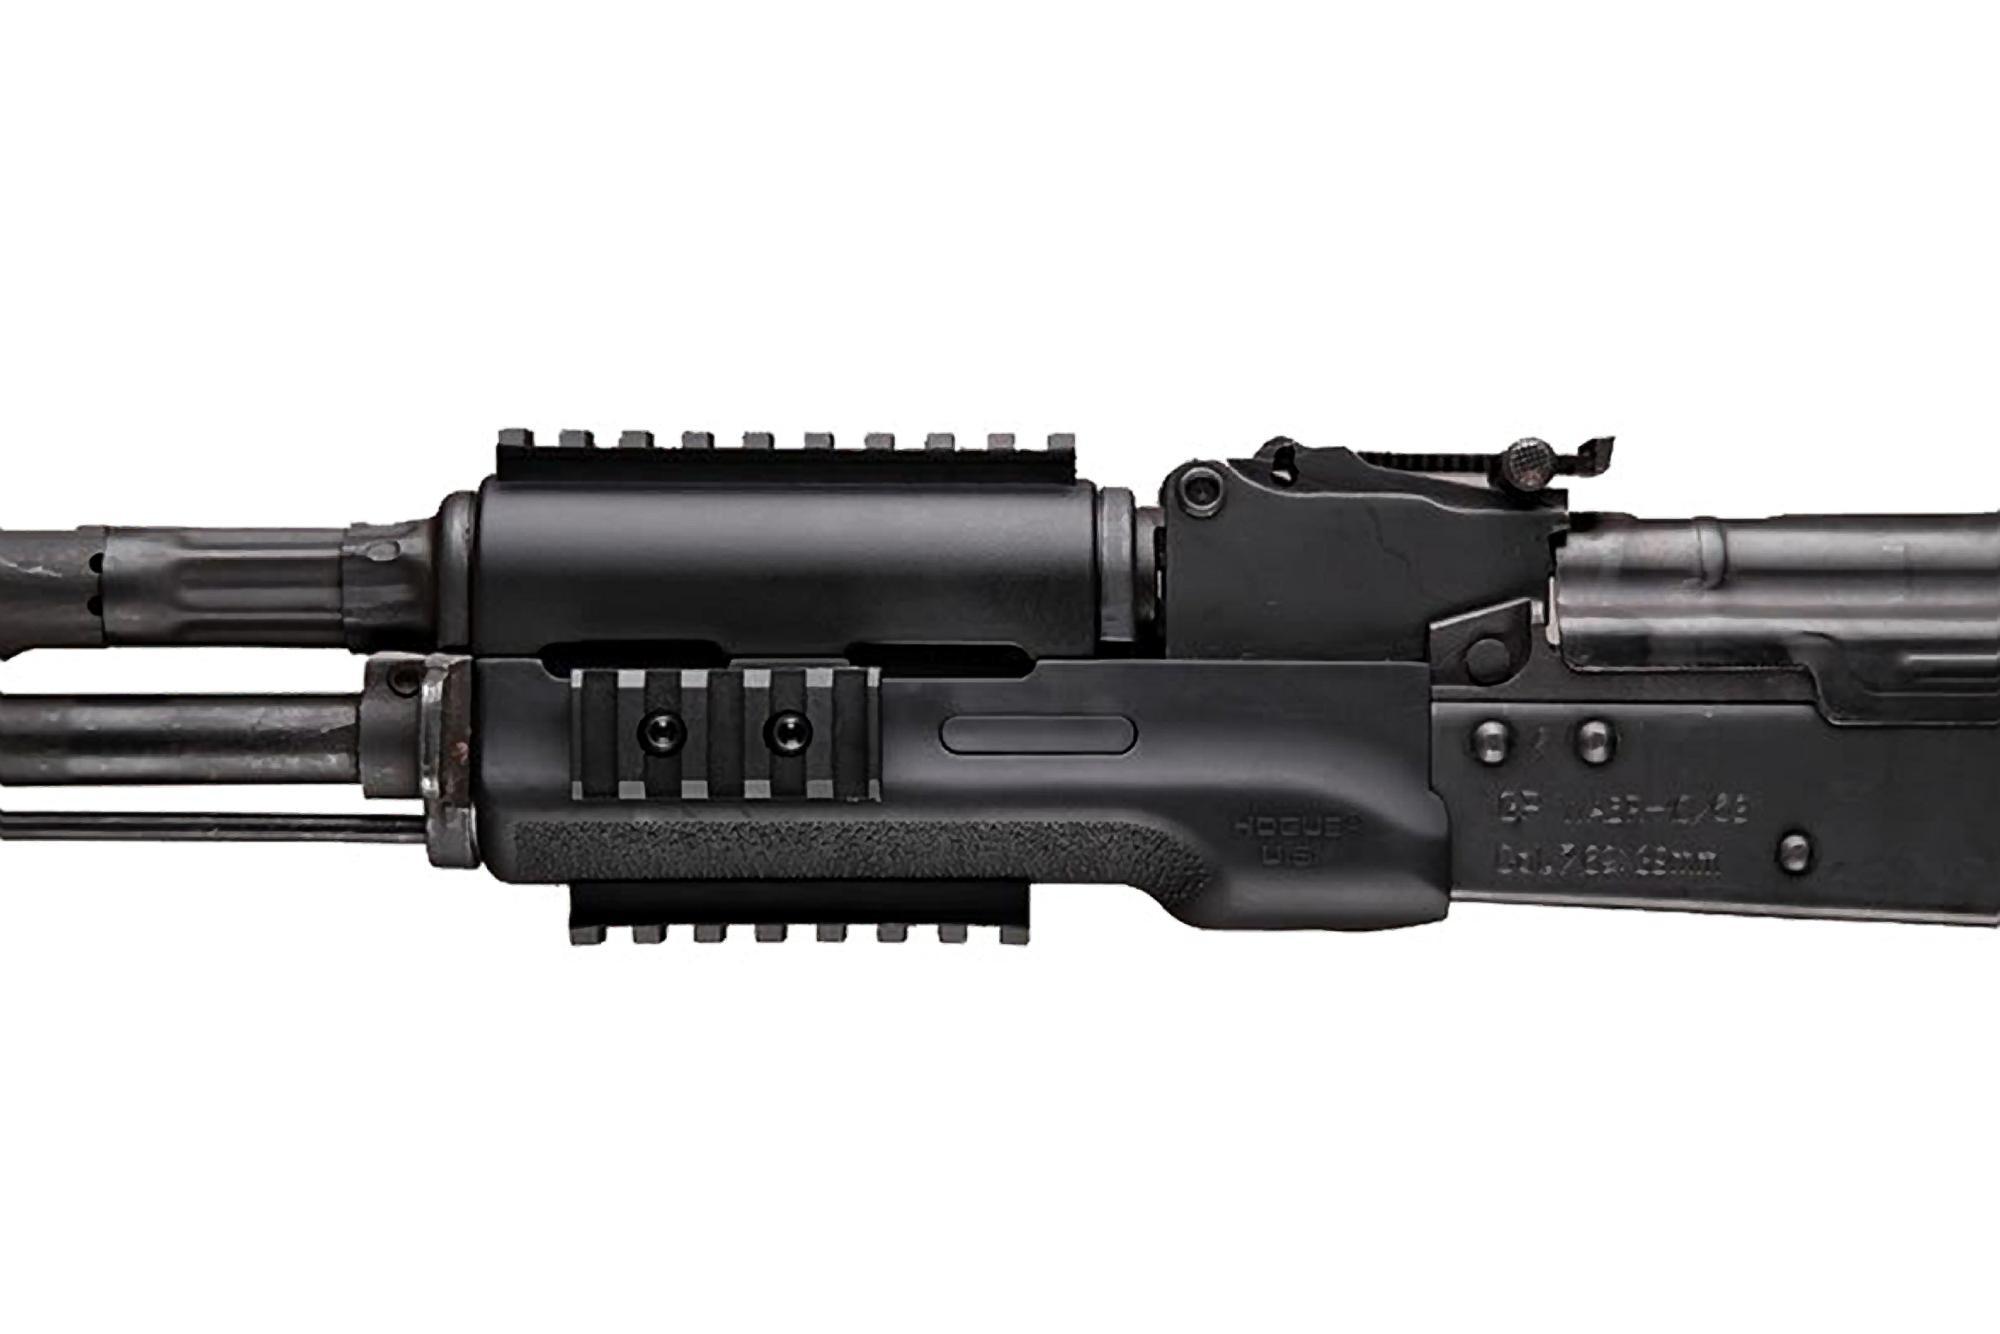 Hogue AK-47/AK-74 Standard OverMolded Handguard - Chinese / Russian Stamped  AKs